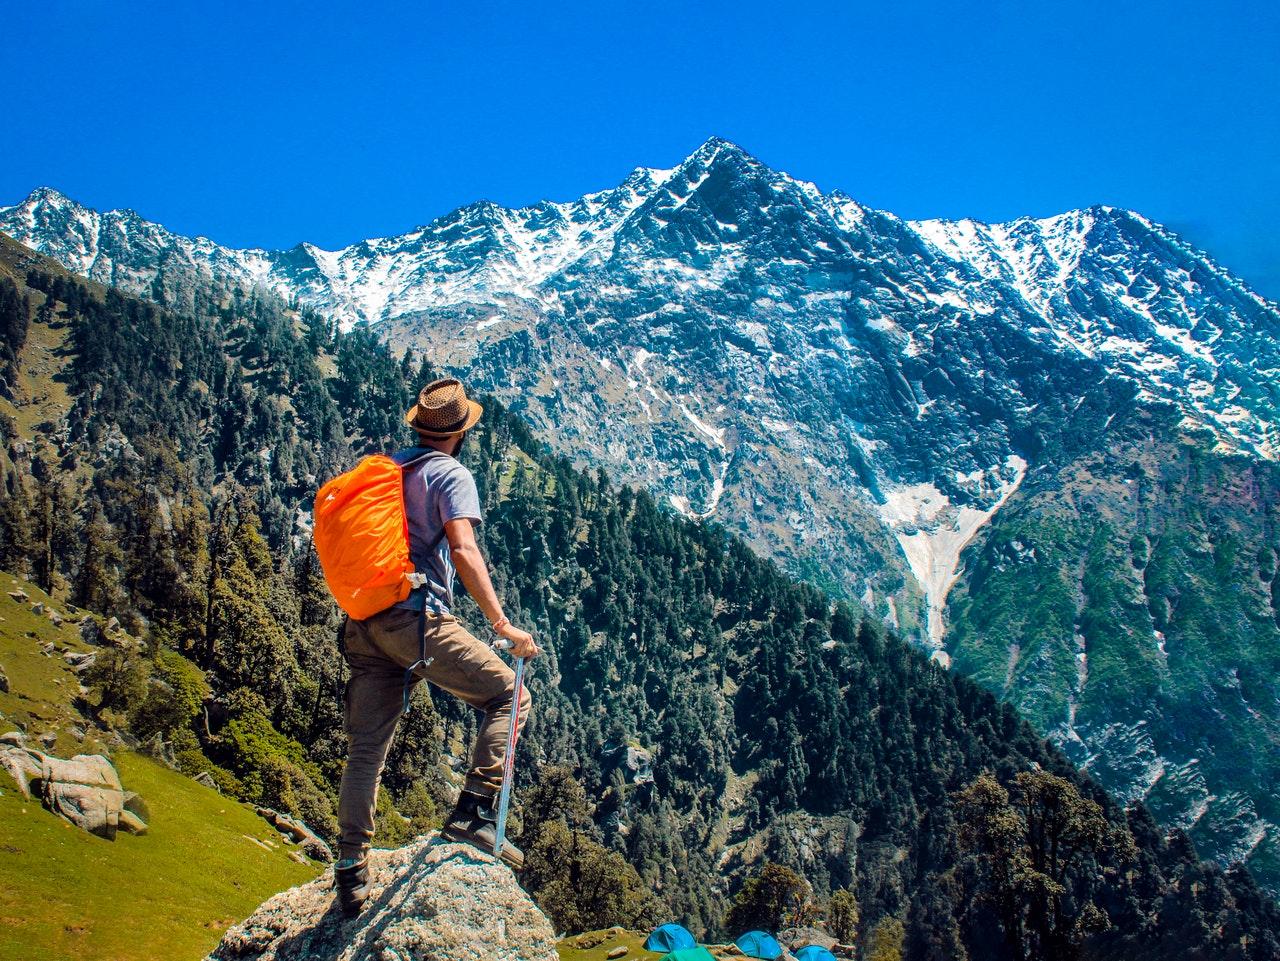 adventure-backpacker-blue-2450296